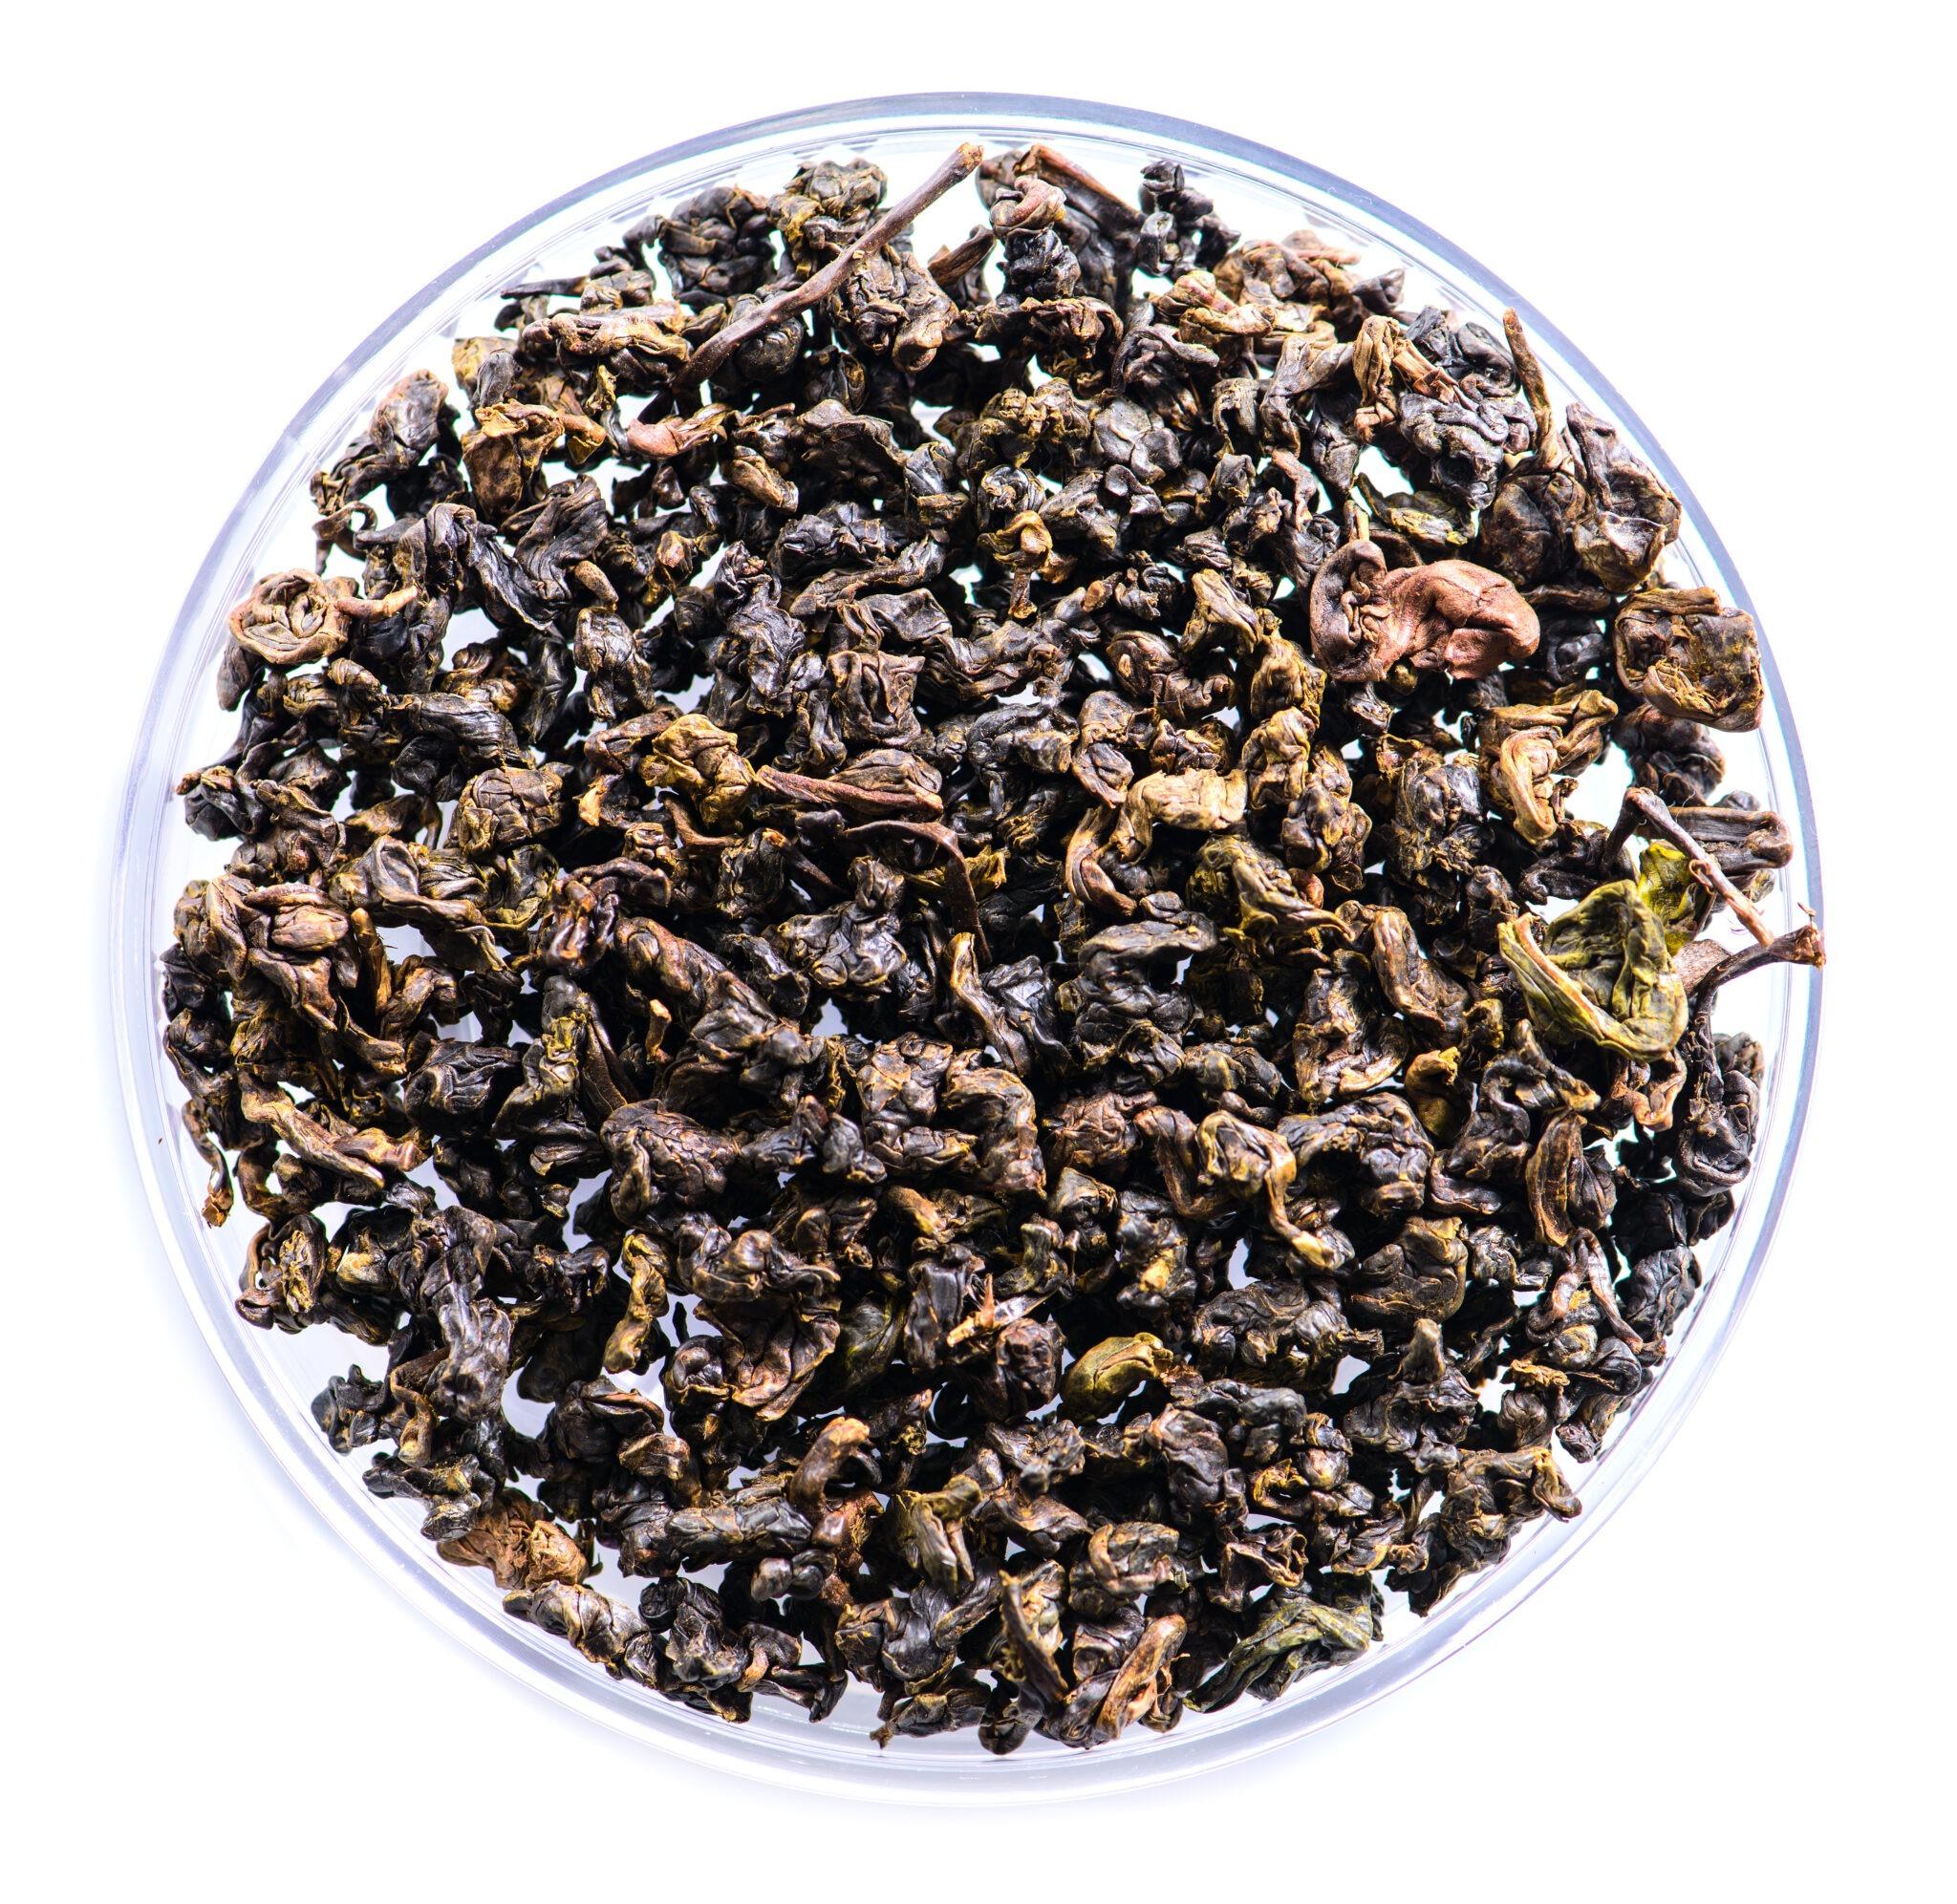 GABA tea health benefits and side effects